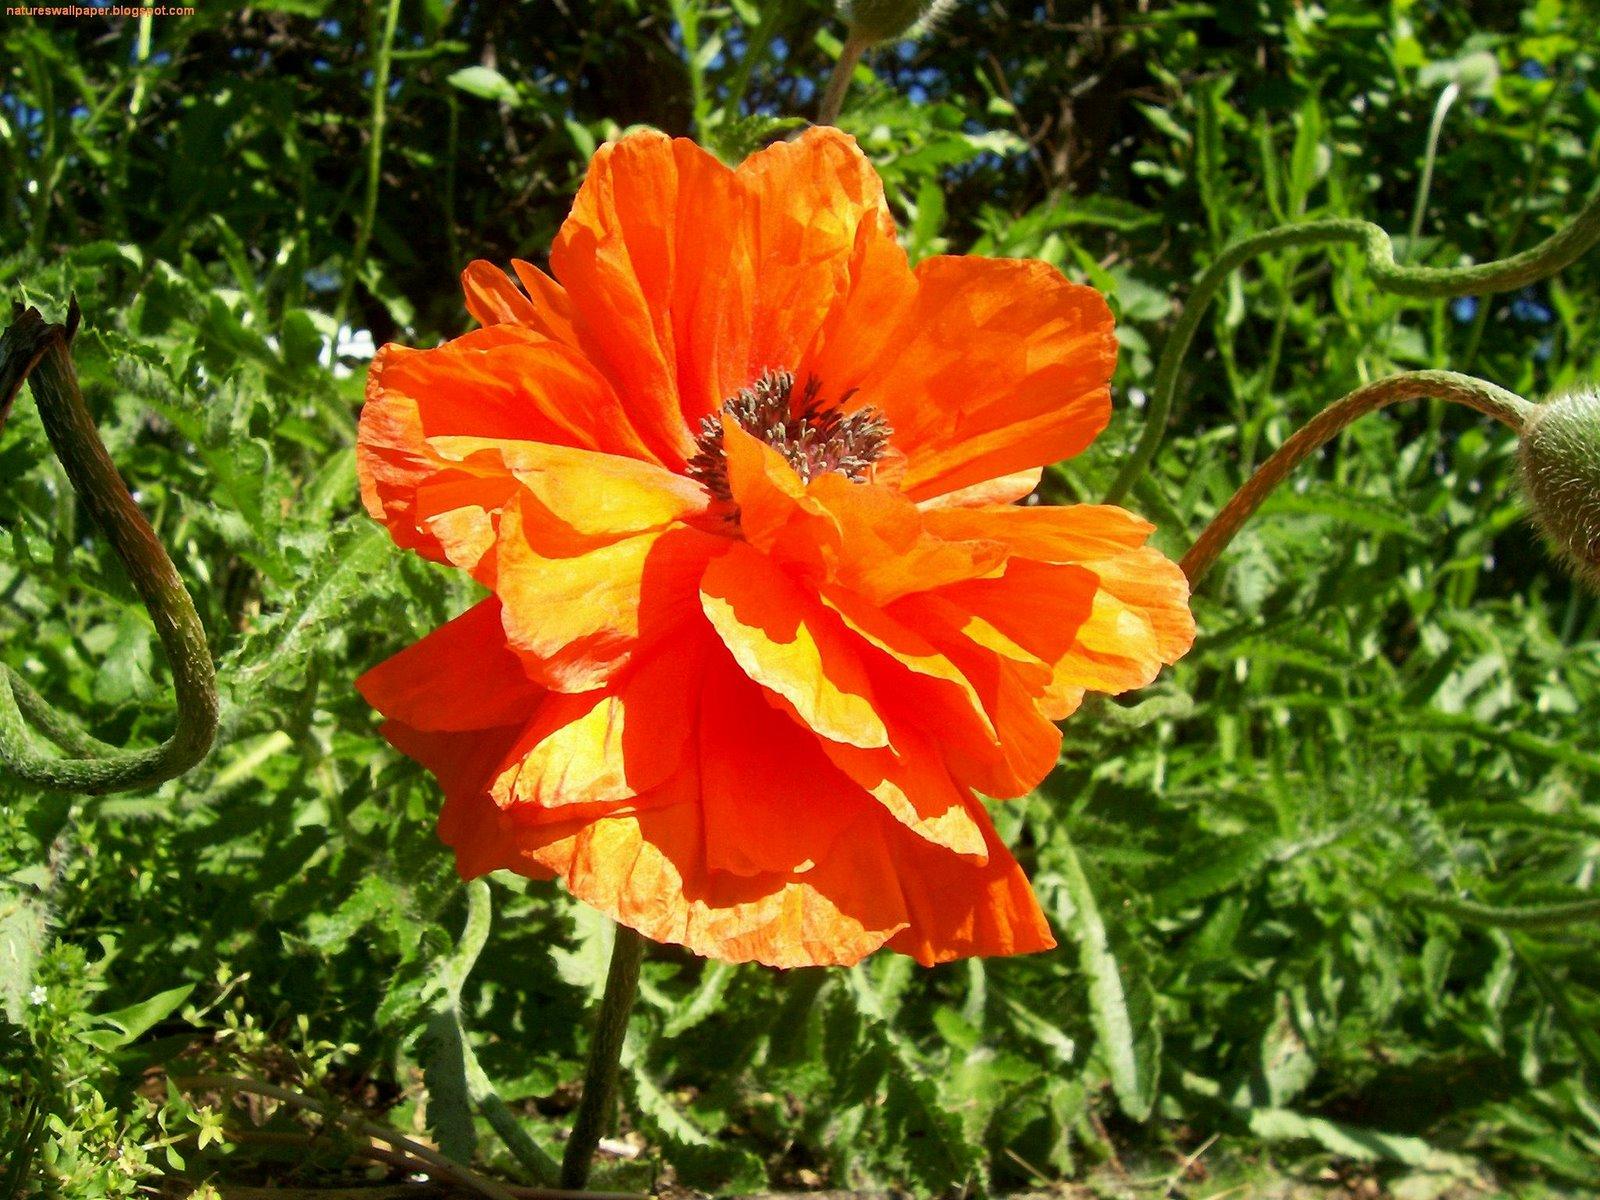 http://2.bp.blogspot.com/_ZWw3x1gj3hQ/TM6WX6CW81I/AAAAAAAAJ5s/_AfL0kuCpAM/s1600/Close-Up,+Flowers,+Nature,+Orange,+Photography,+wallpaper.jpg